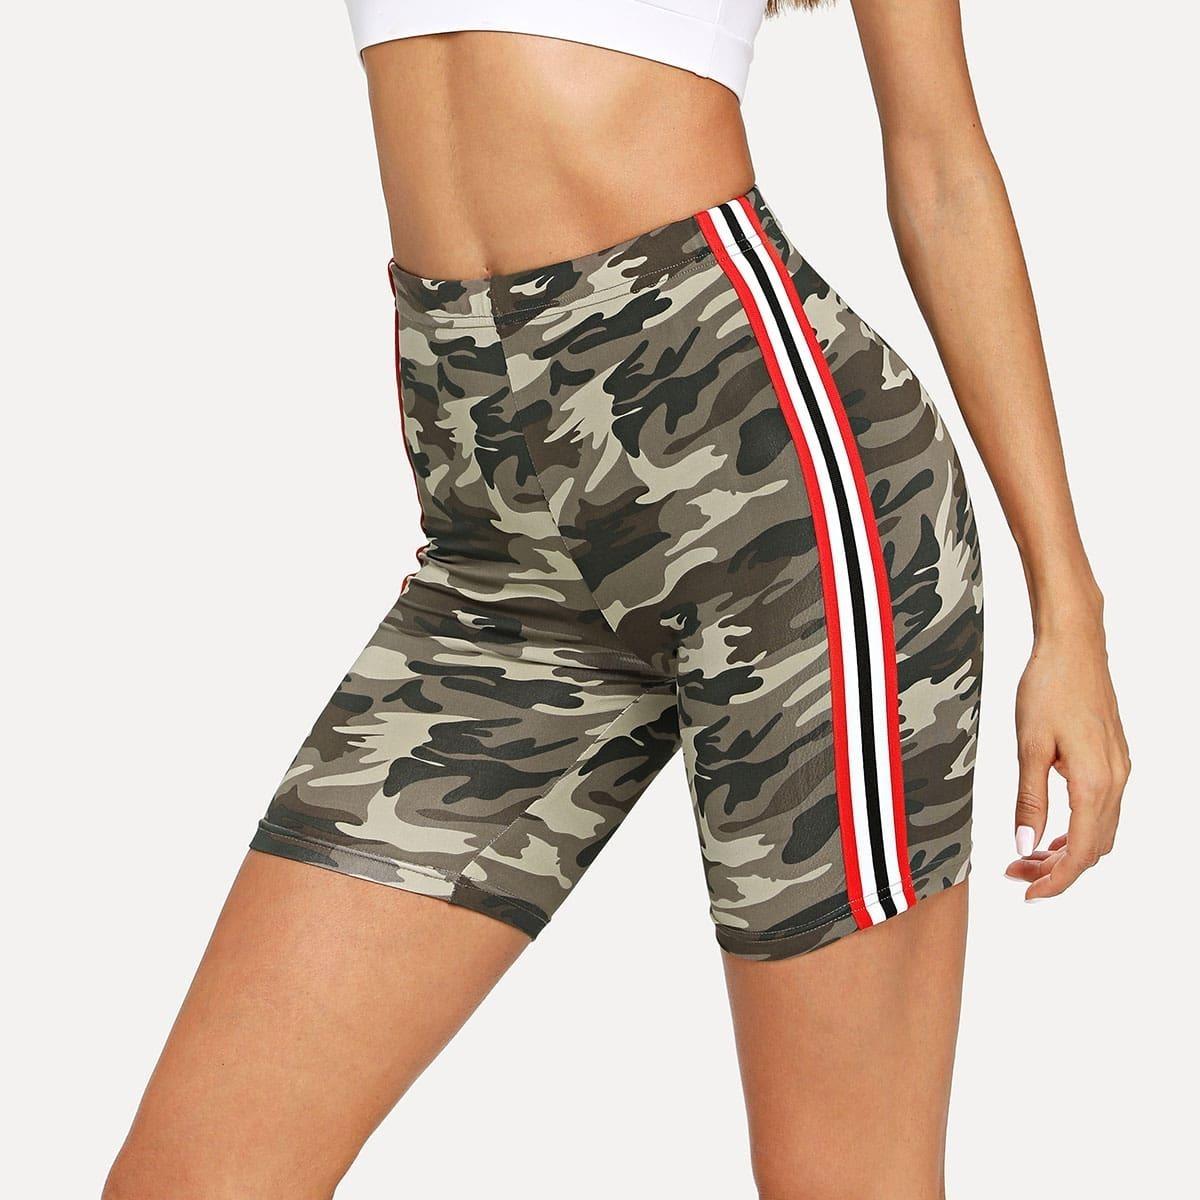 - Side Striped Leopard Print Leggings Shorts